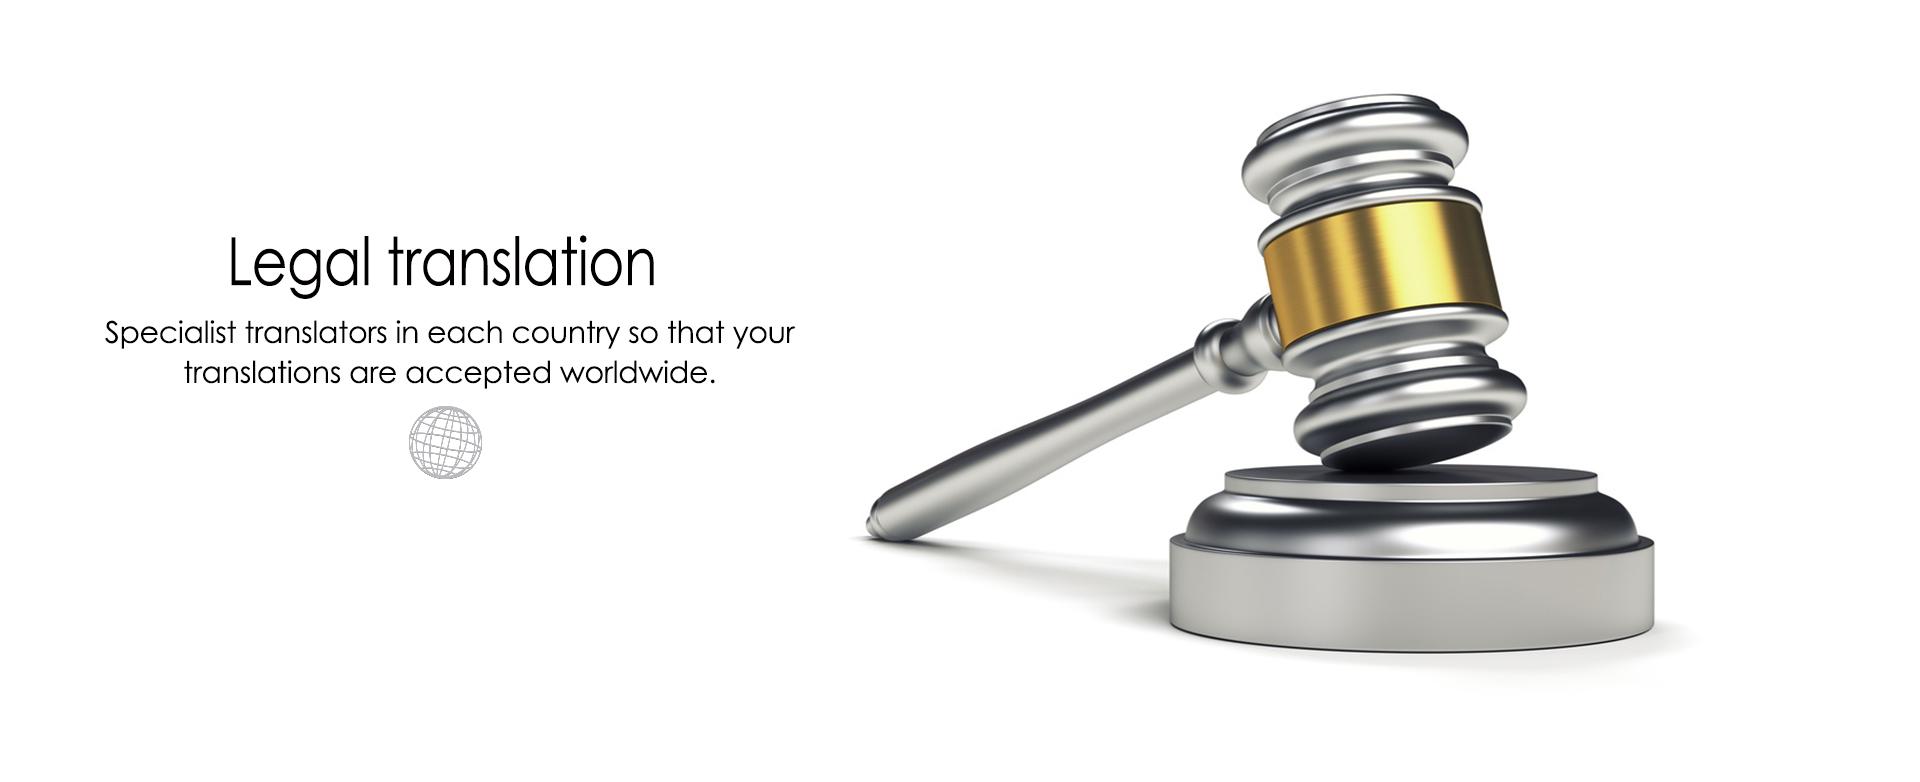 legal-translation